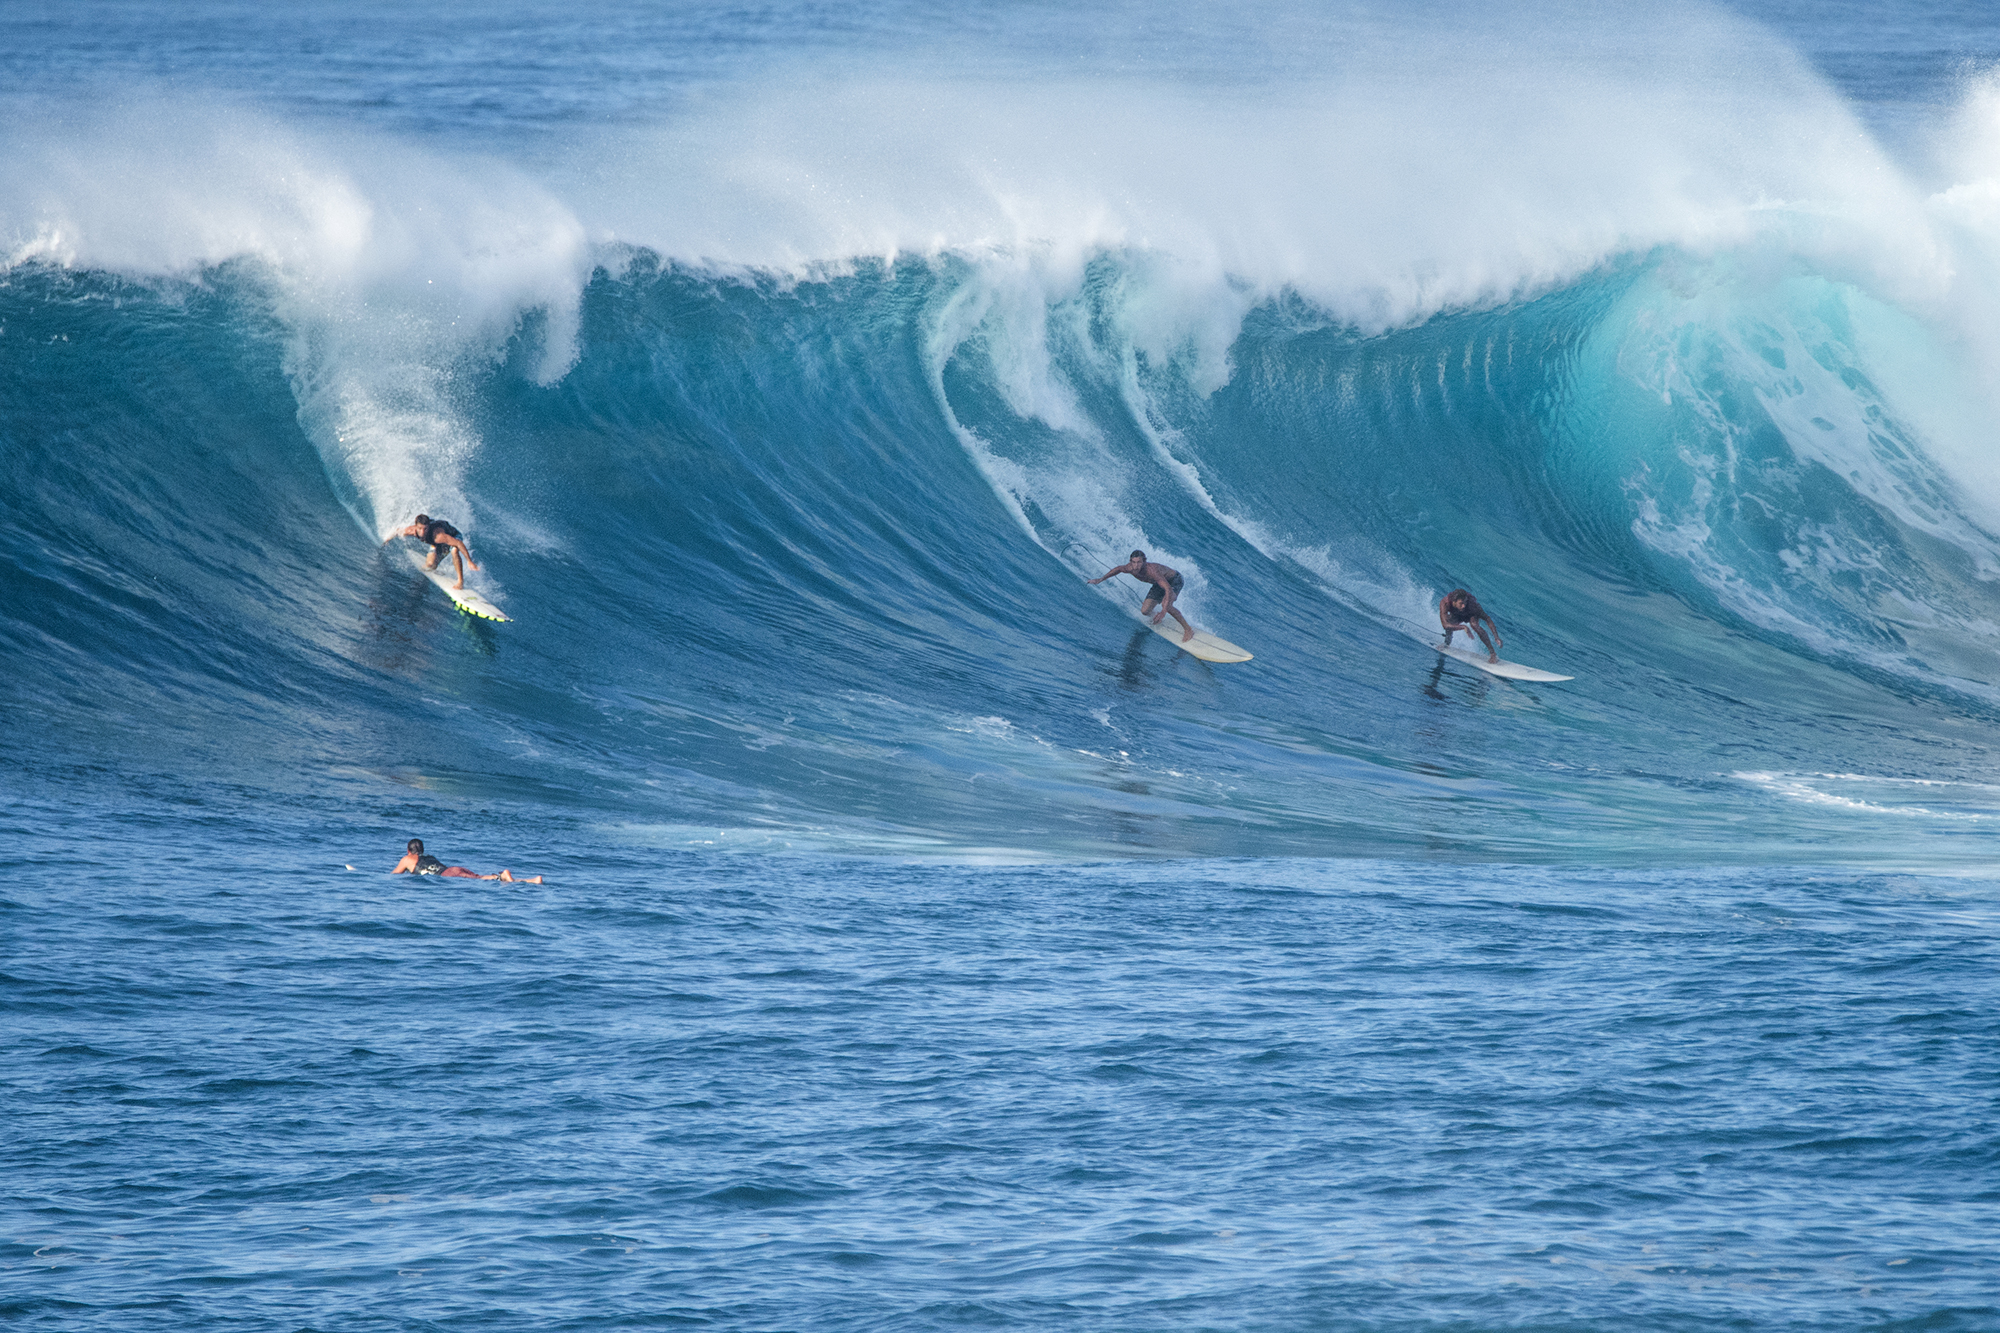 nice wave 3 guys hard bottom turn